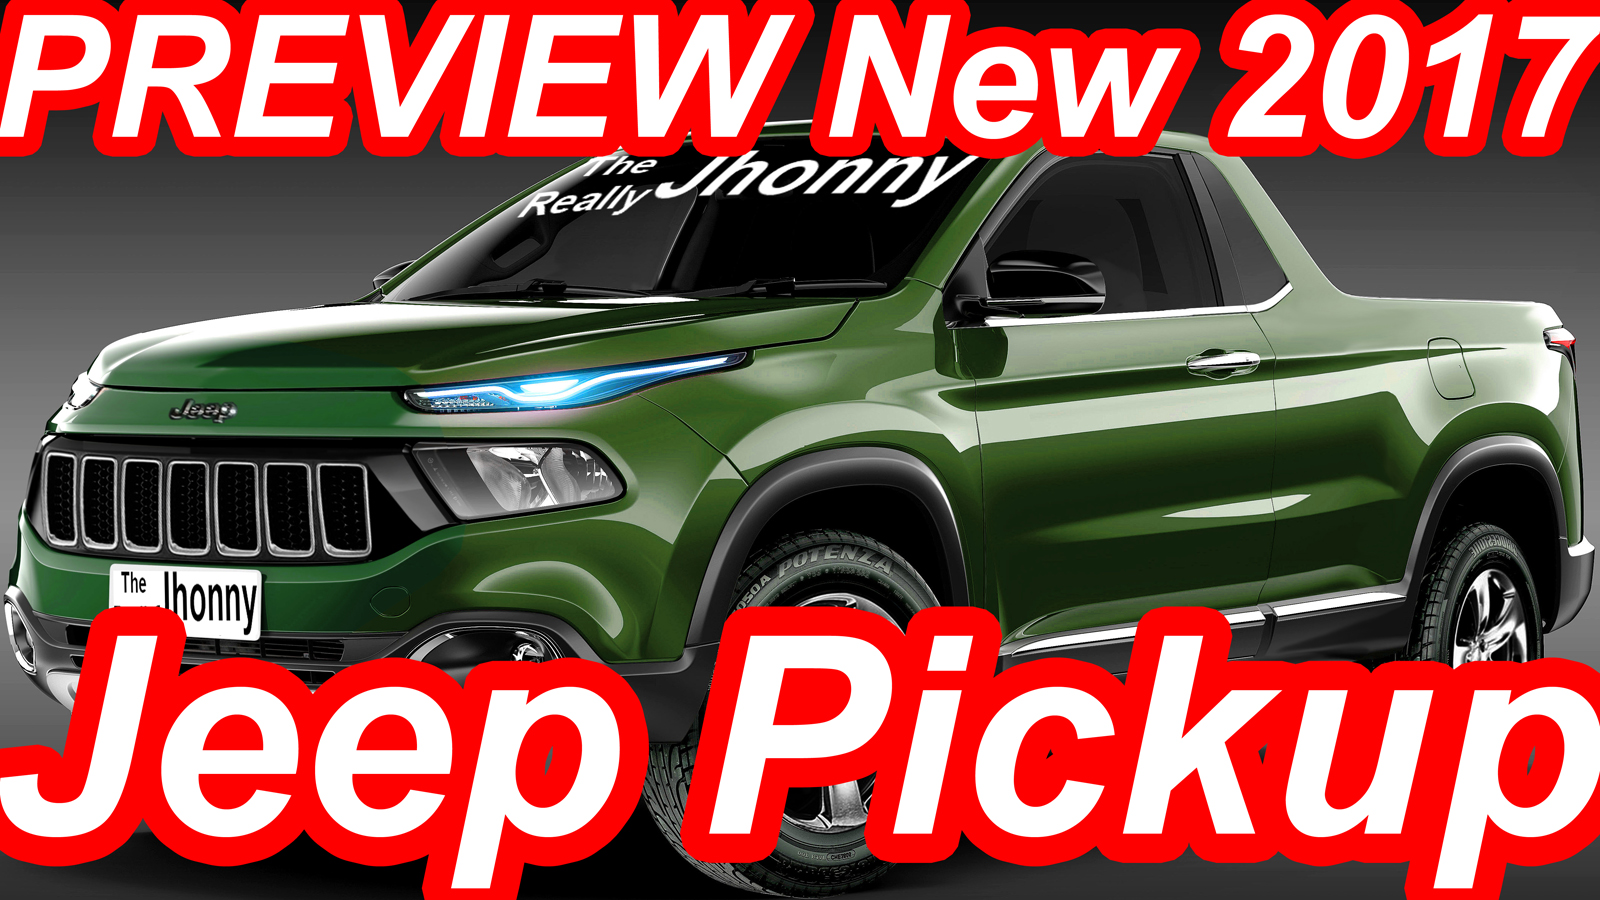 Jeep Cherokee New PRÉVIA Nova Jeep Pickup 2017 @ Fiat Toro | CARWP